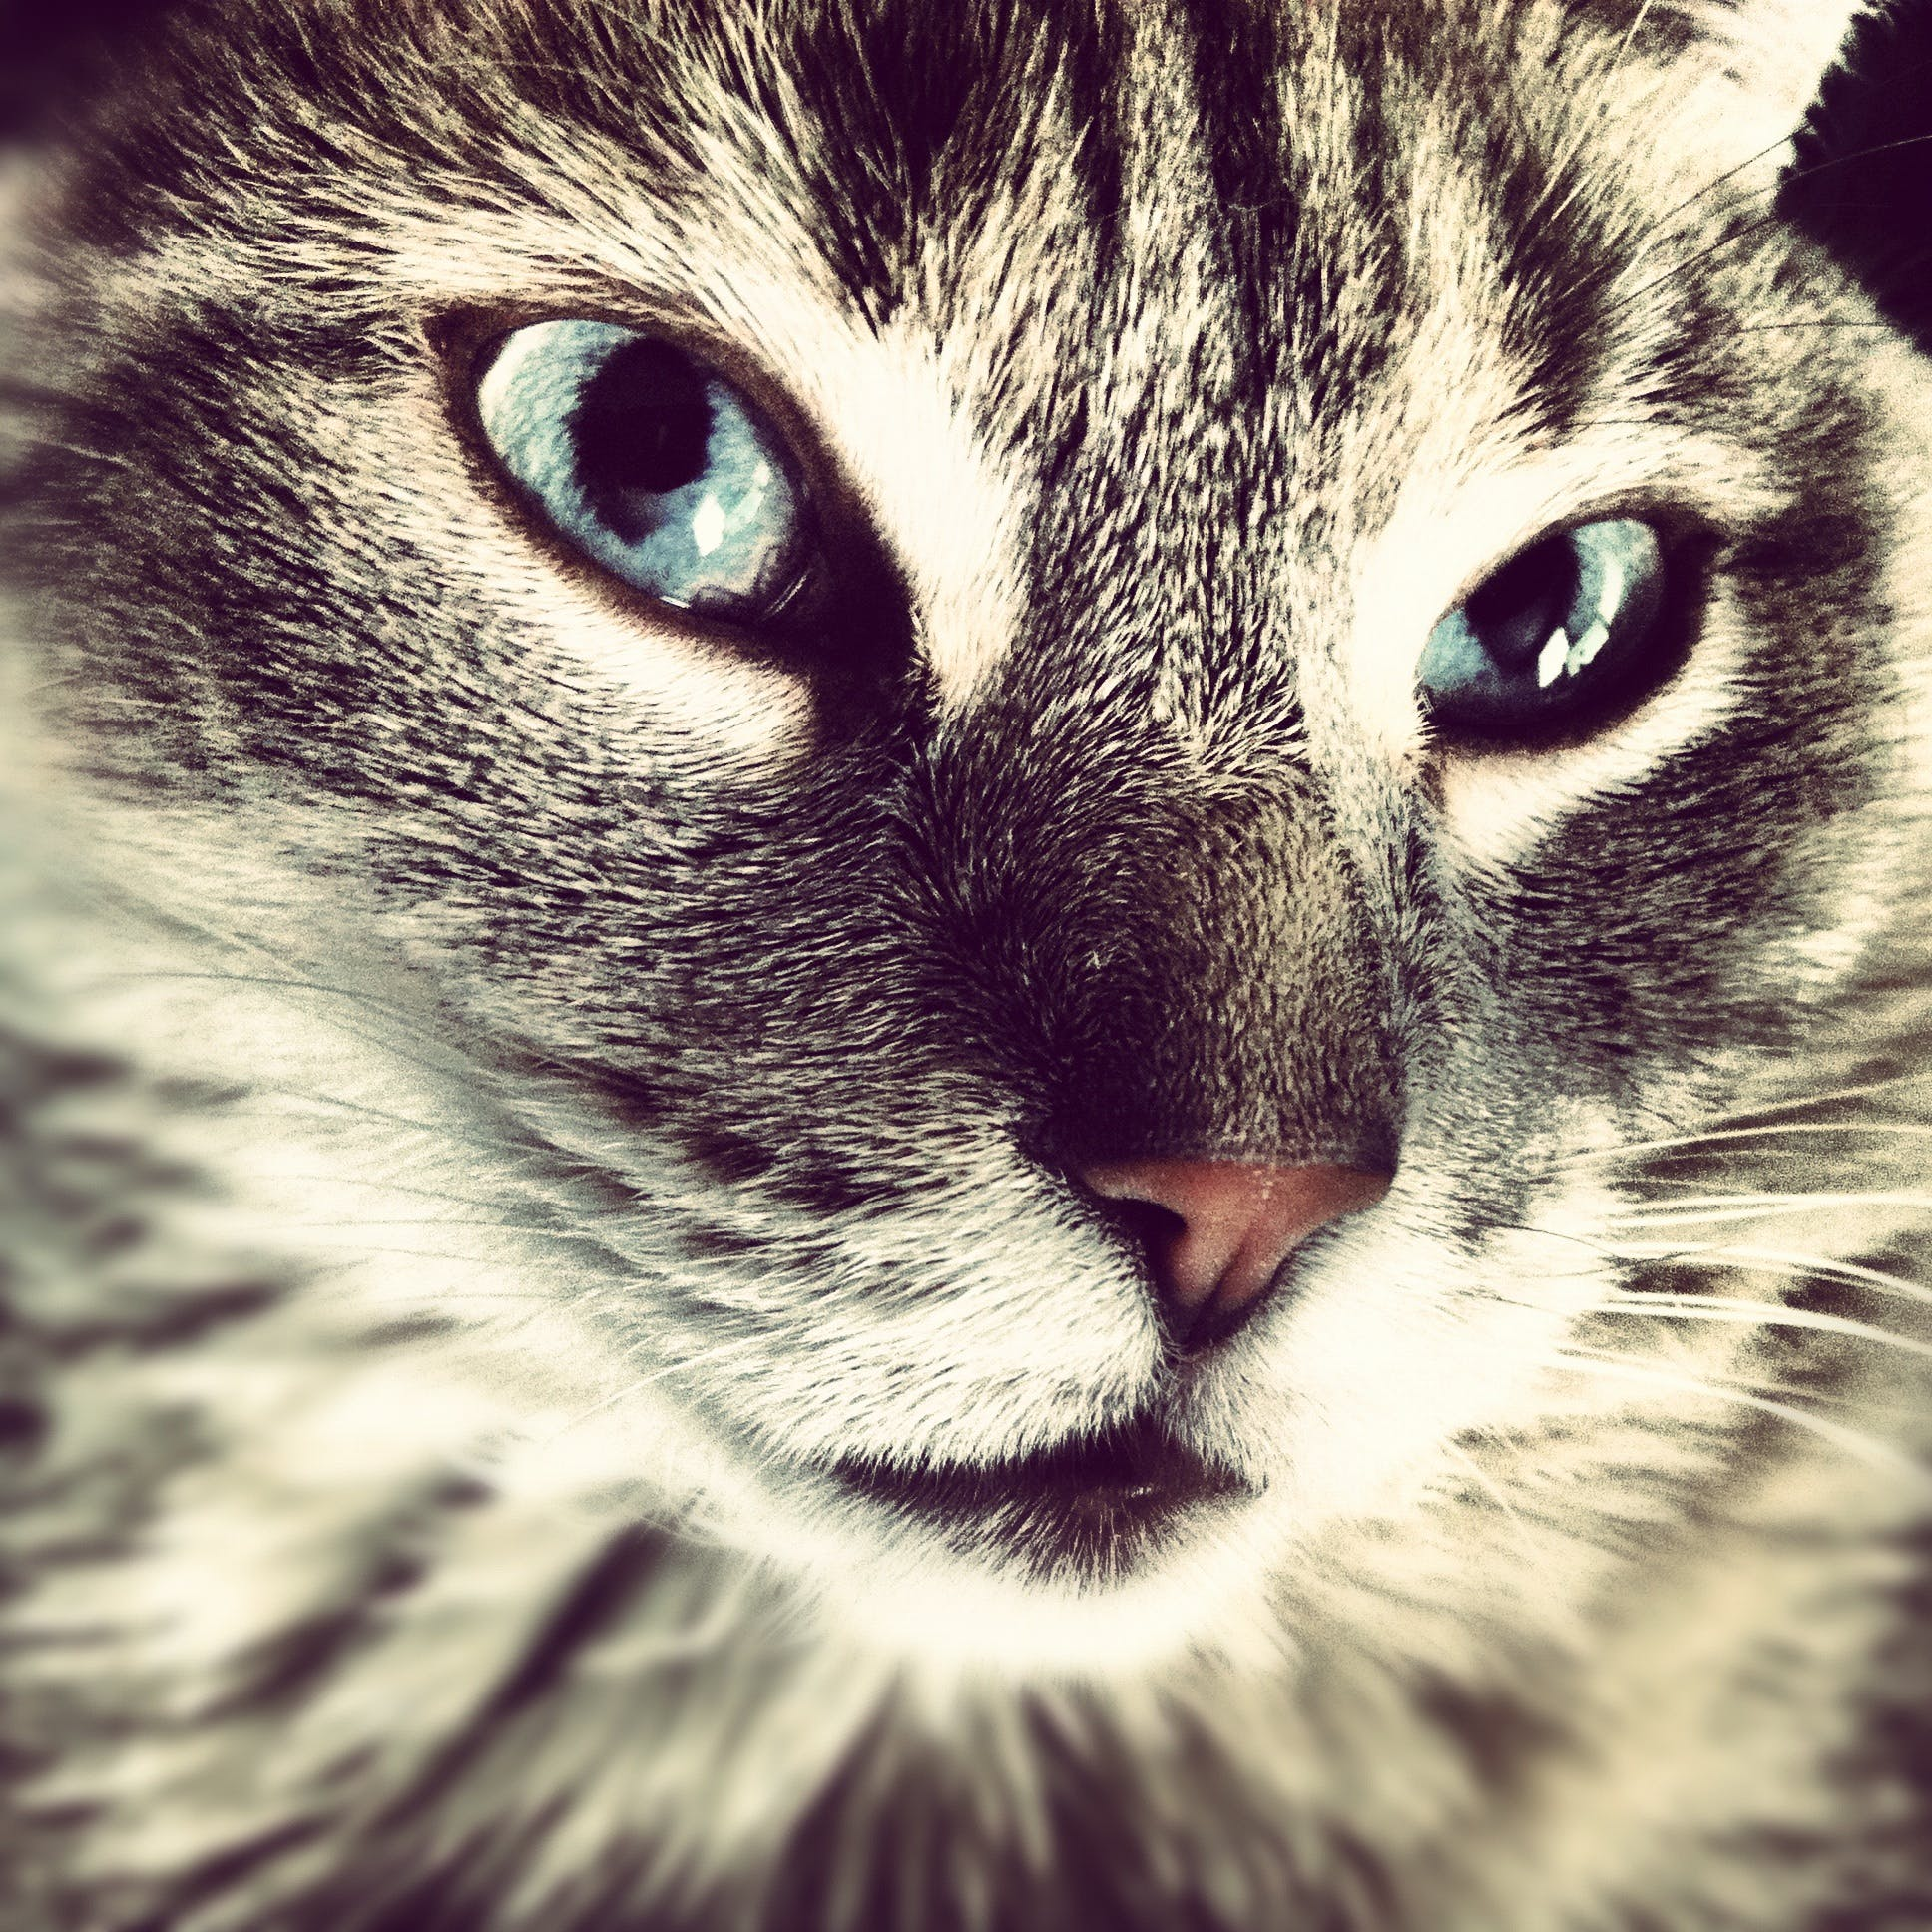 Free stock photo of pet, kitten, cat